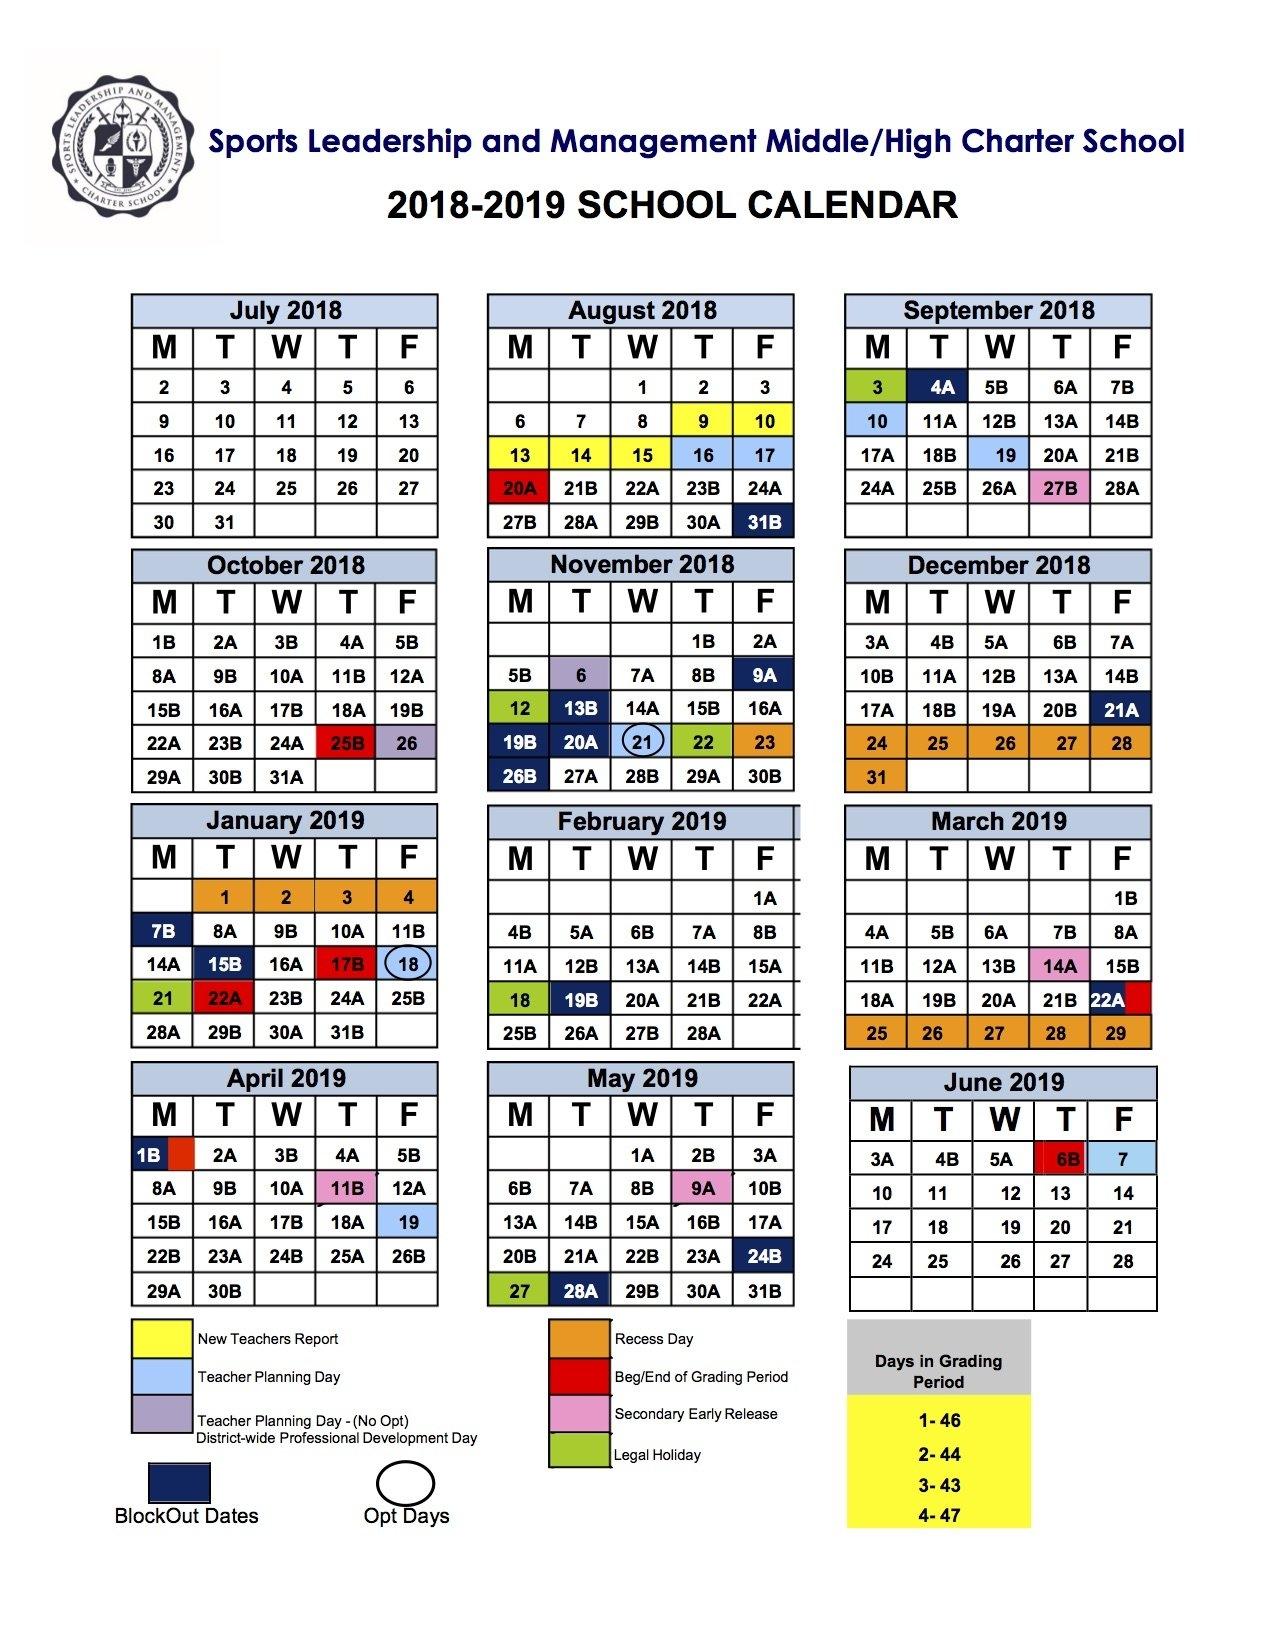 2018-2019 School Calendar Calendar 2019 Ke